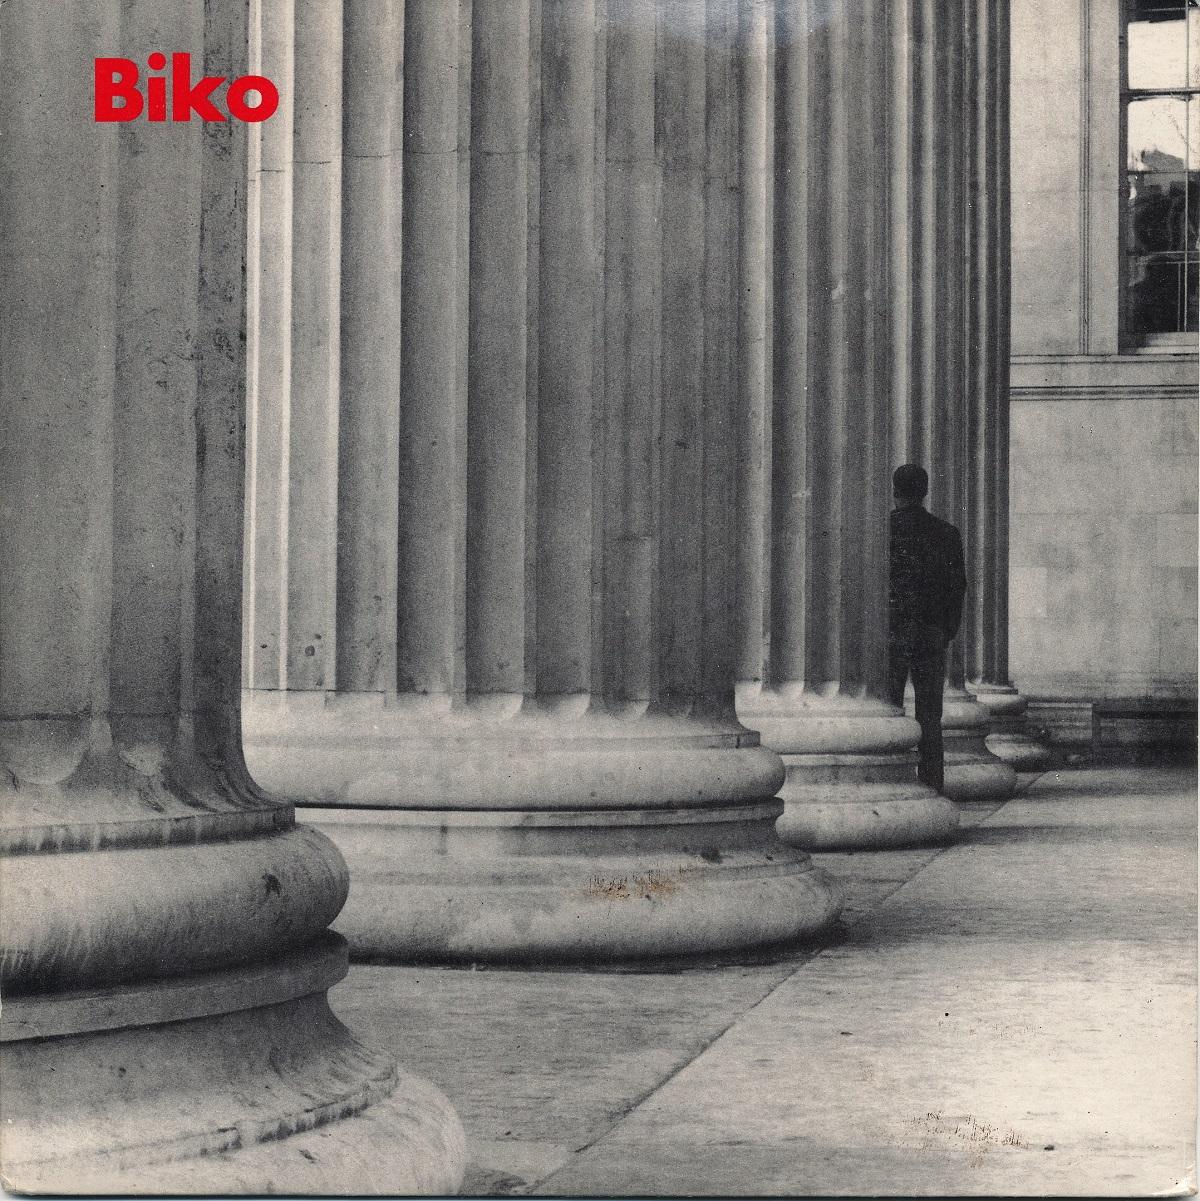 Peter Gabriel - Biko (original)